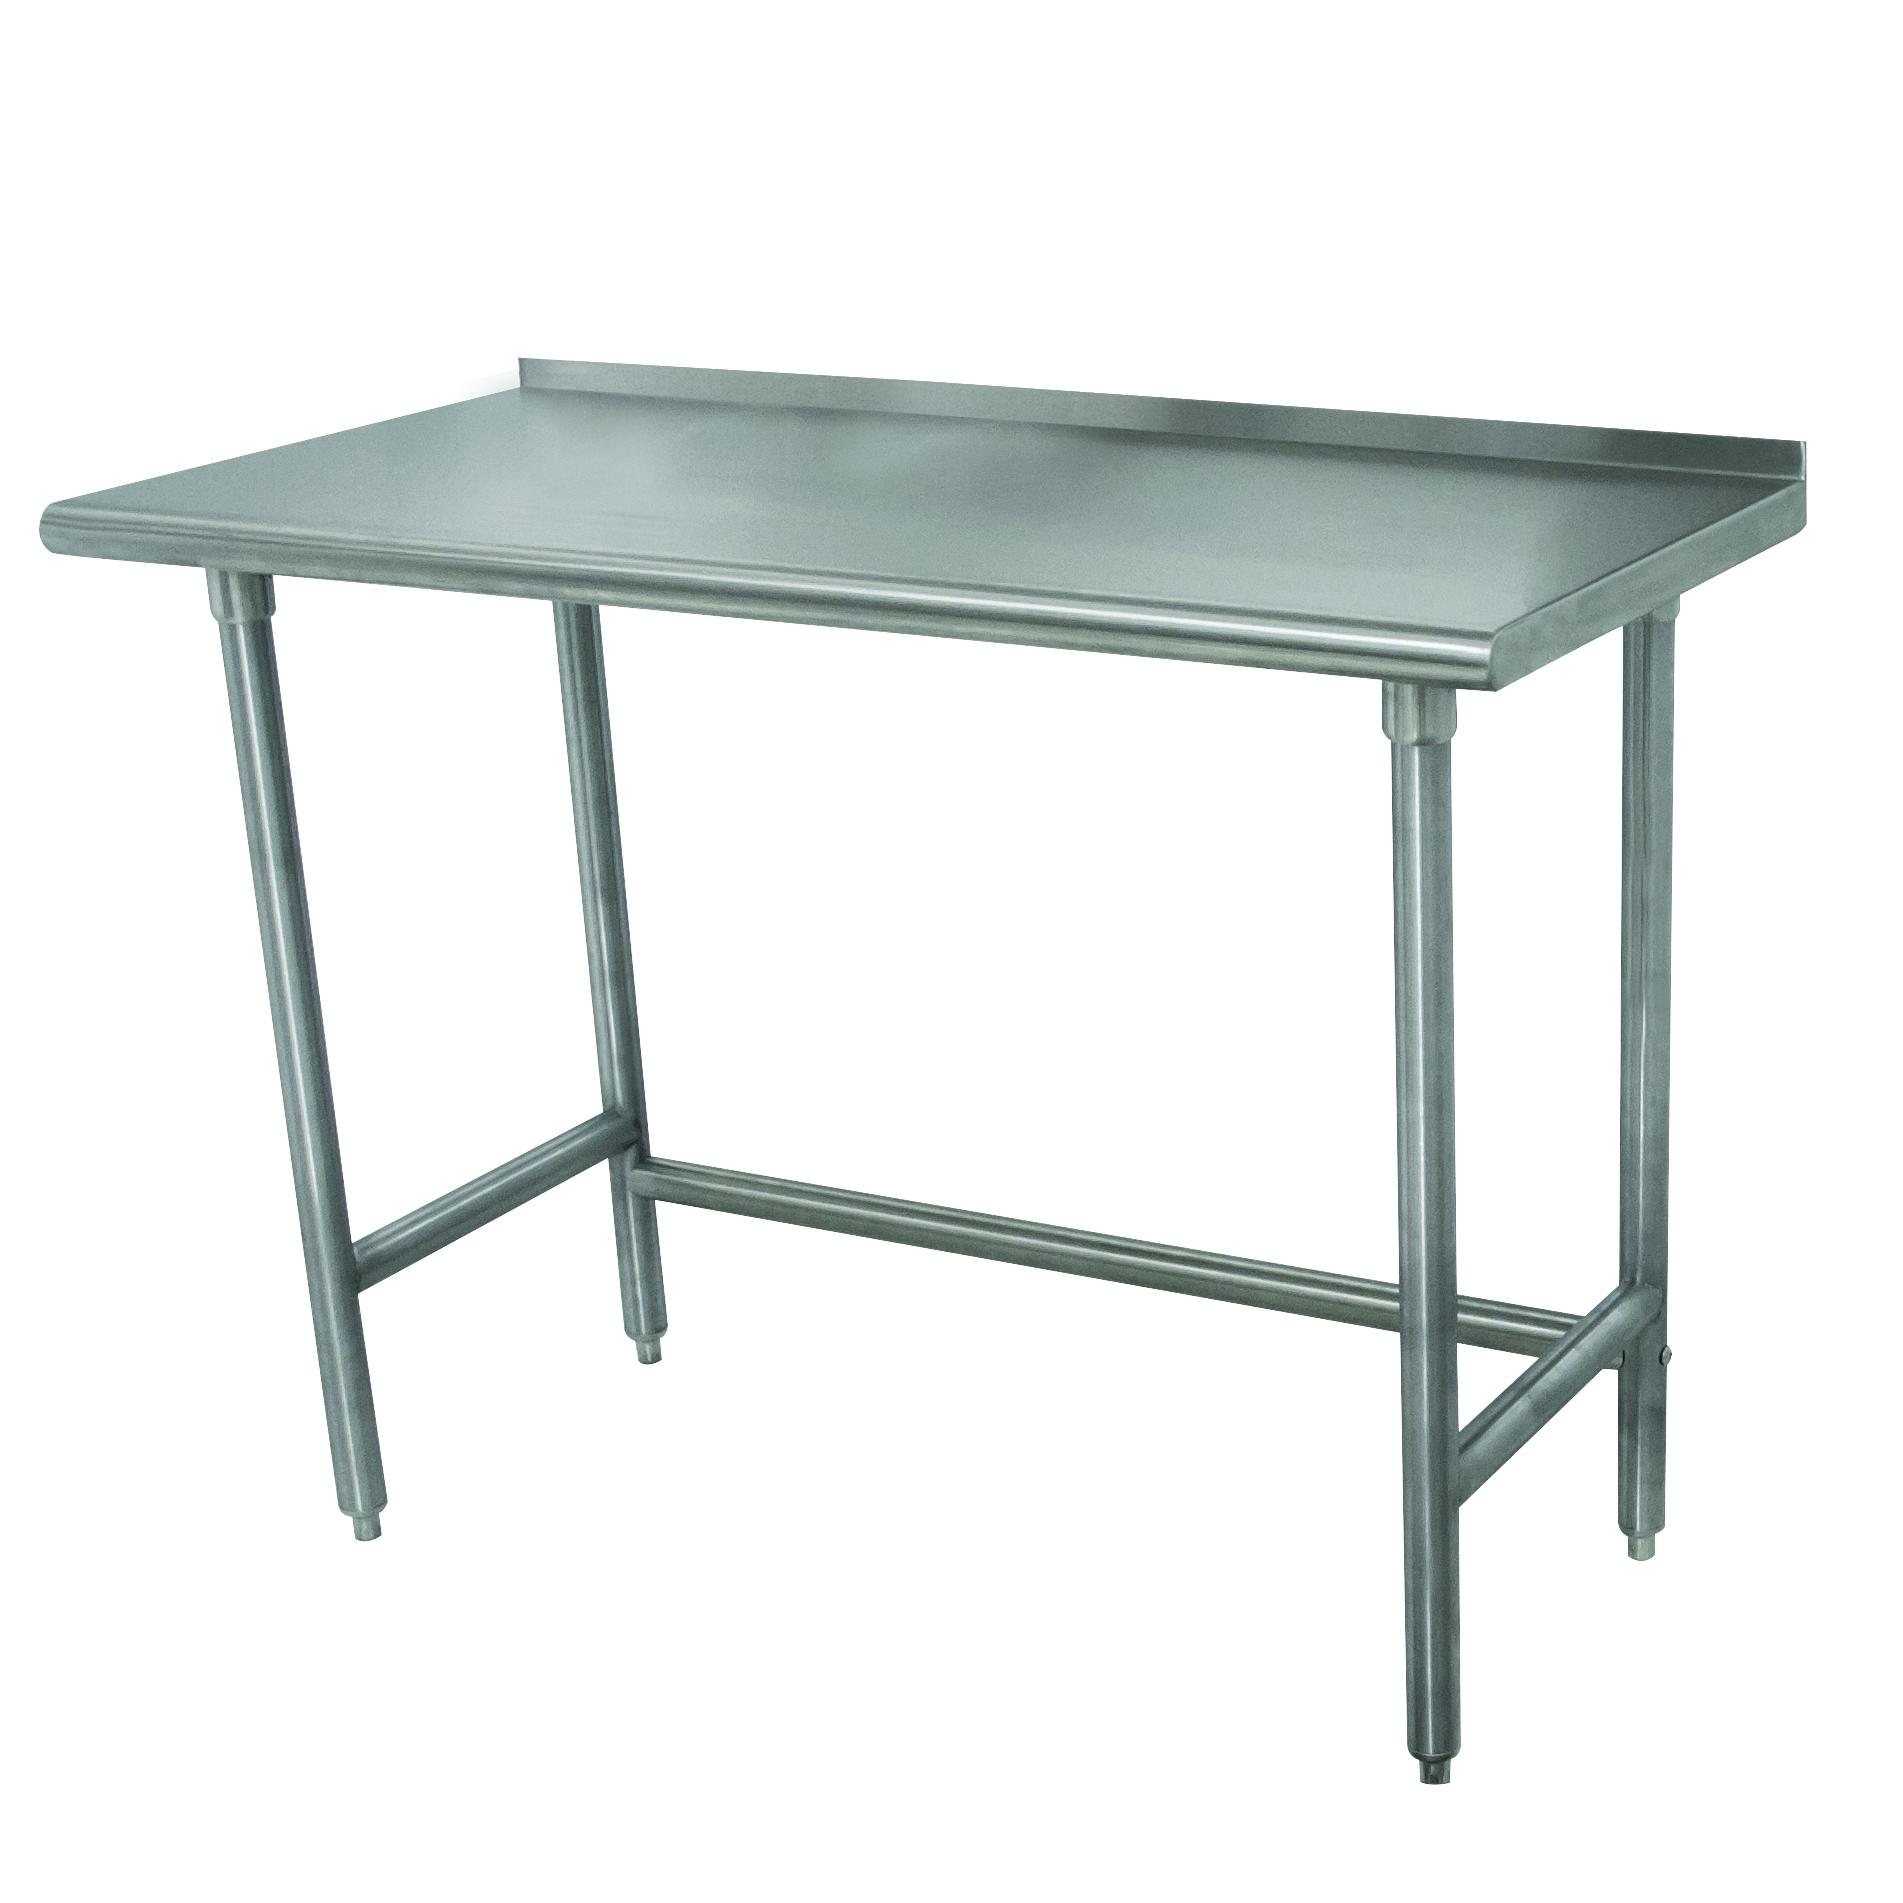 Advance Tabco TSFLAG-364-X work table,  40